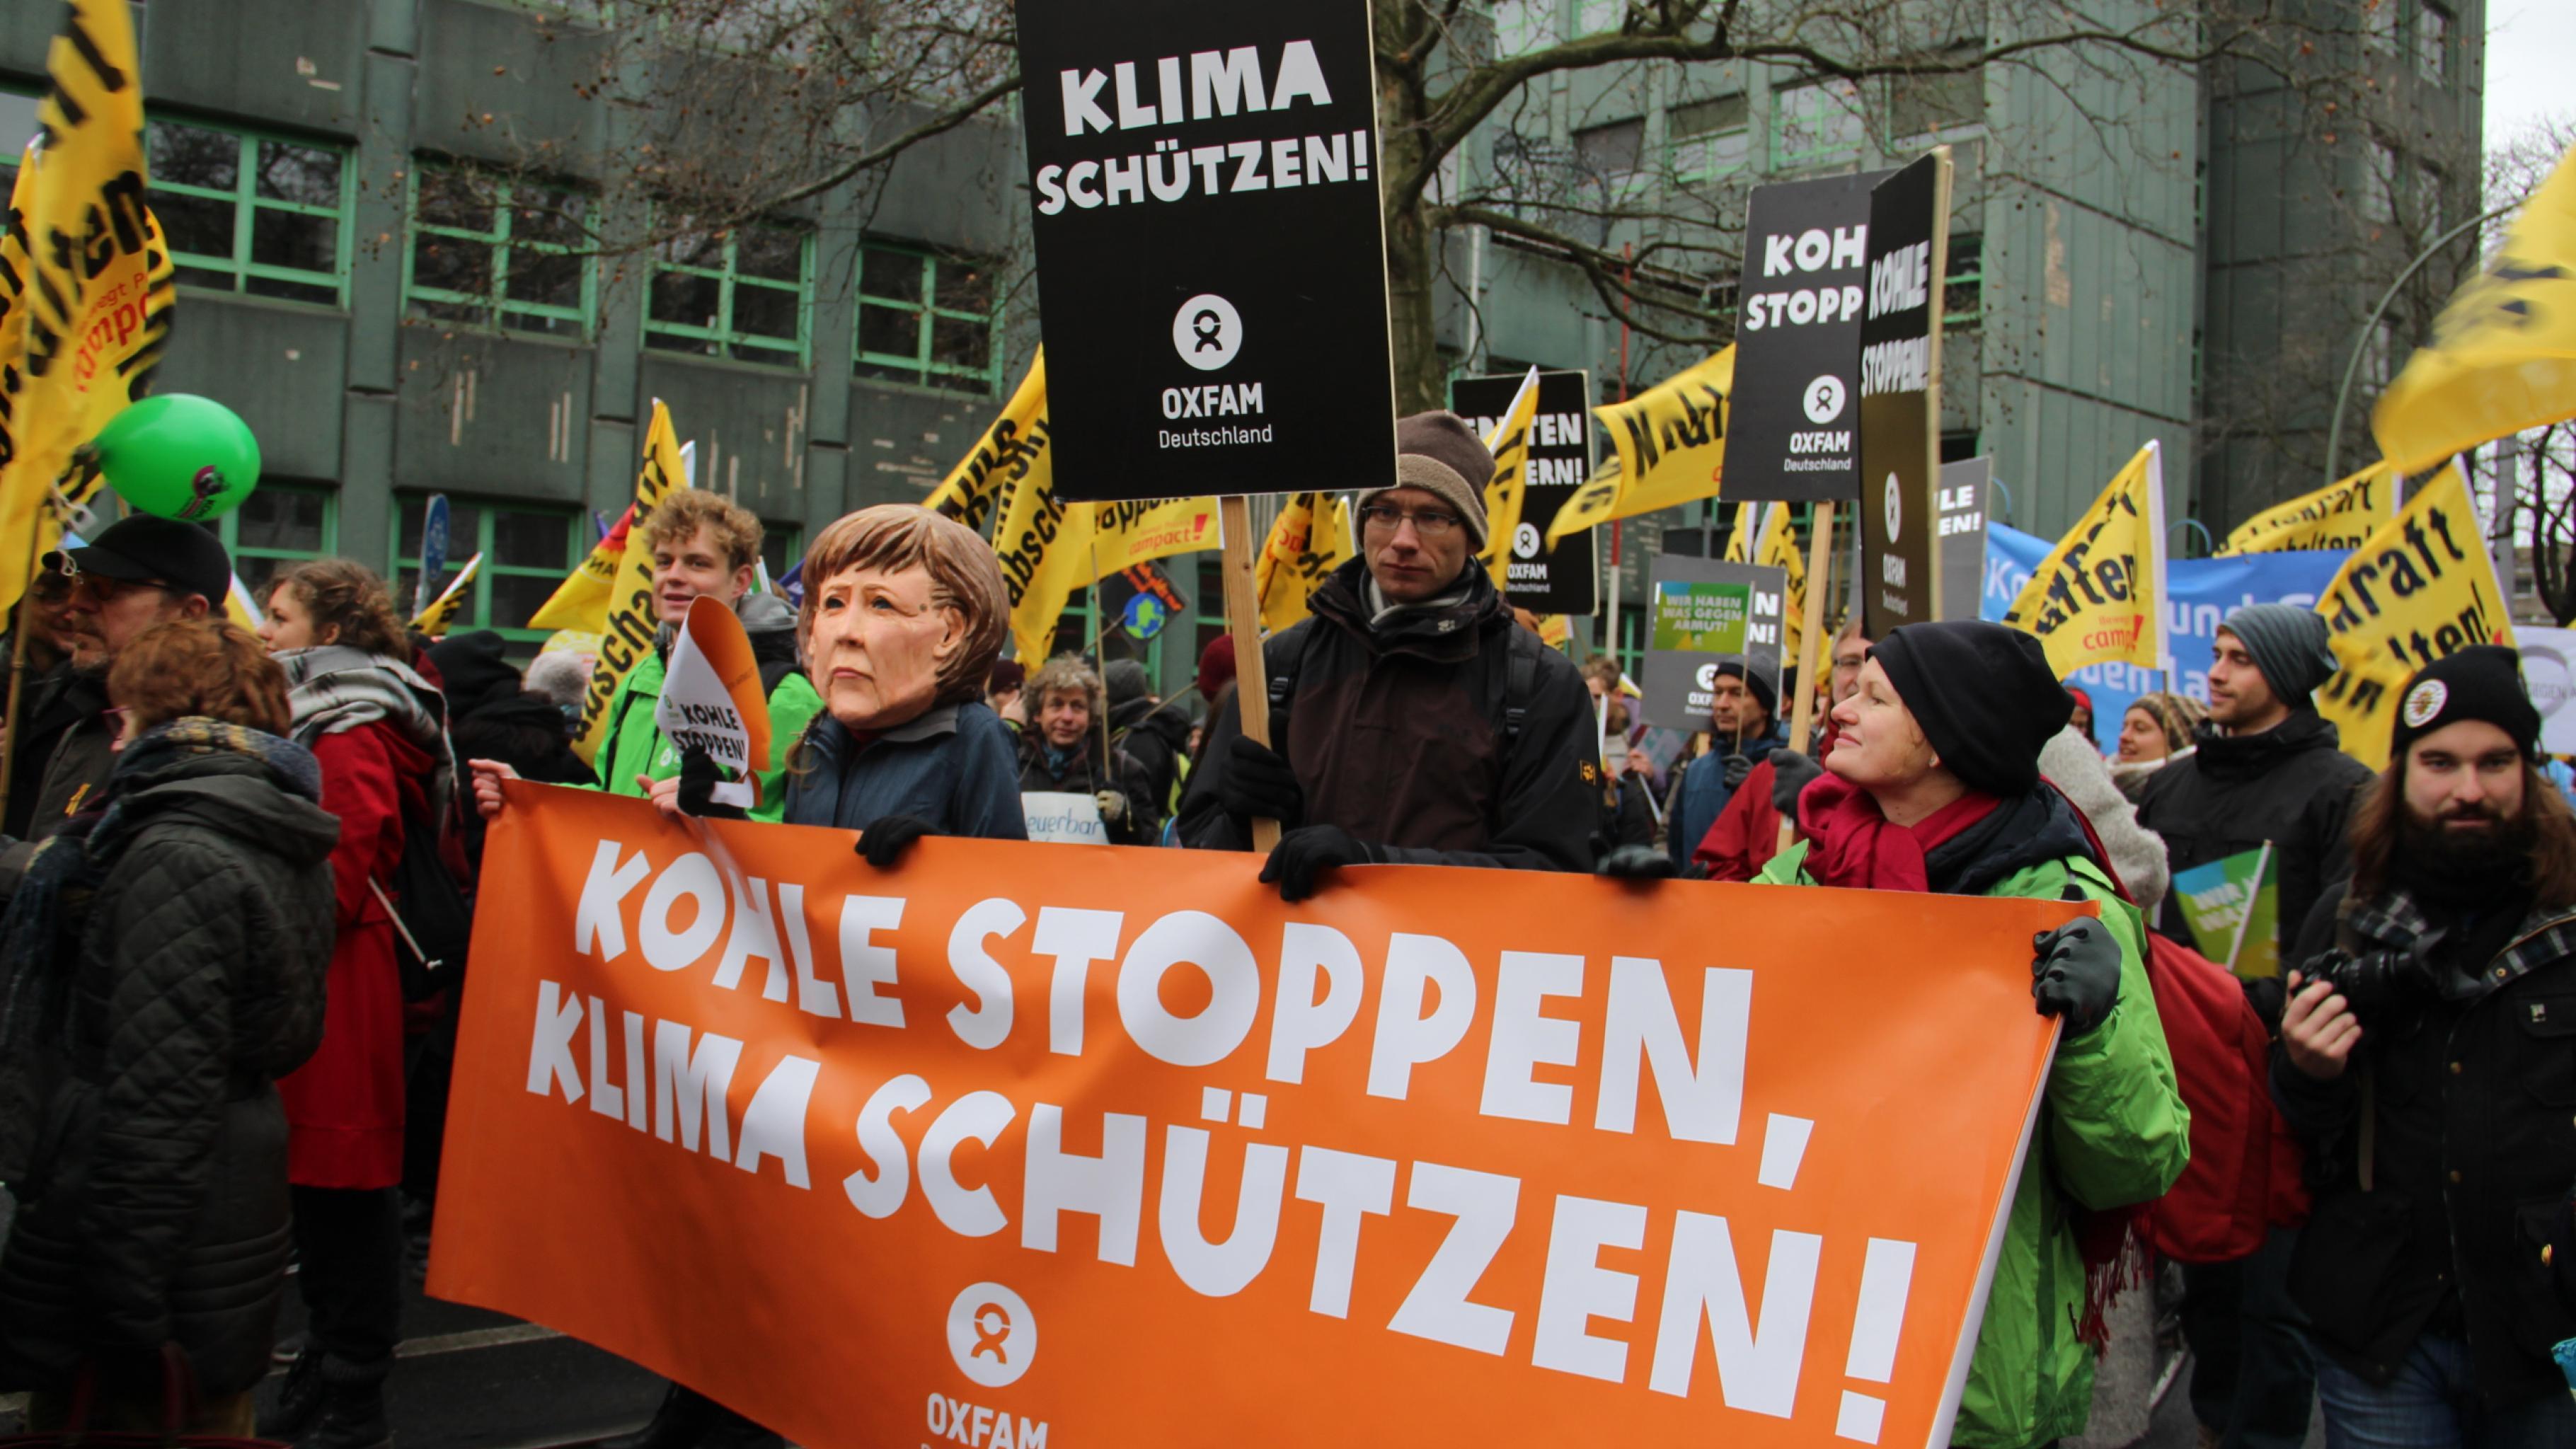 Demonstration zum Global Climate March in Berlin vor dem Pariser Klimagipfel